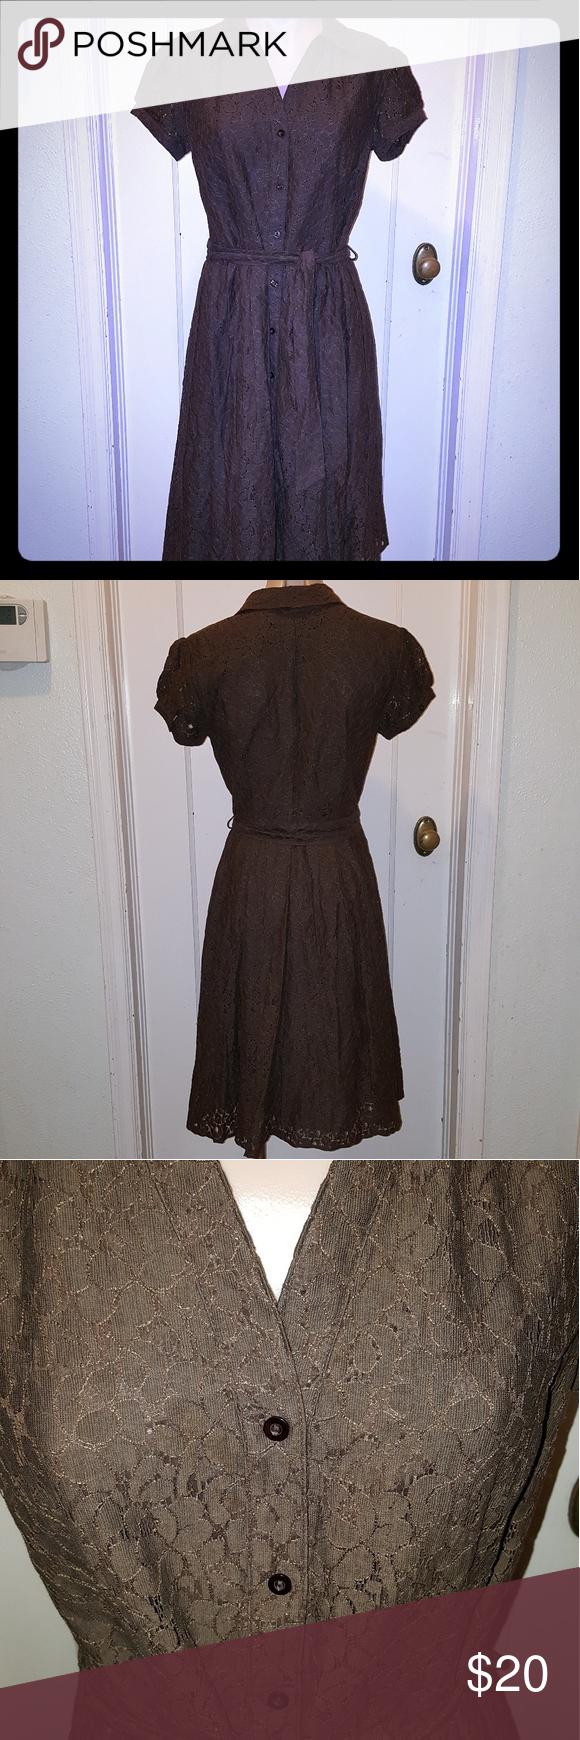 Apt dark brown lace dress belt tying dark brown and classic style